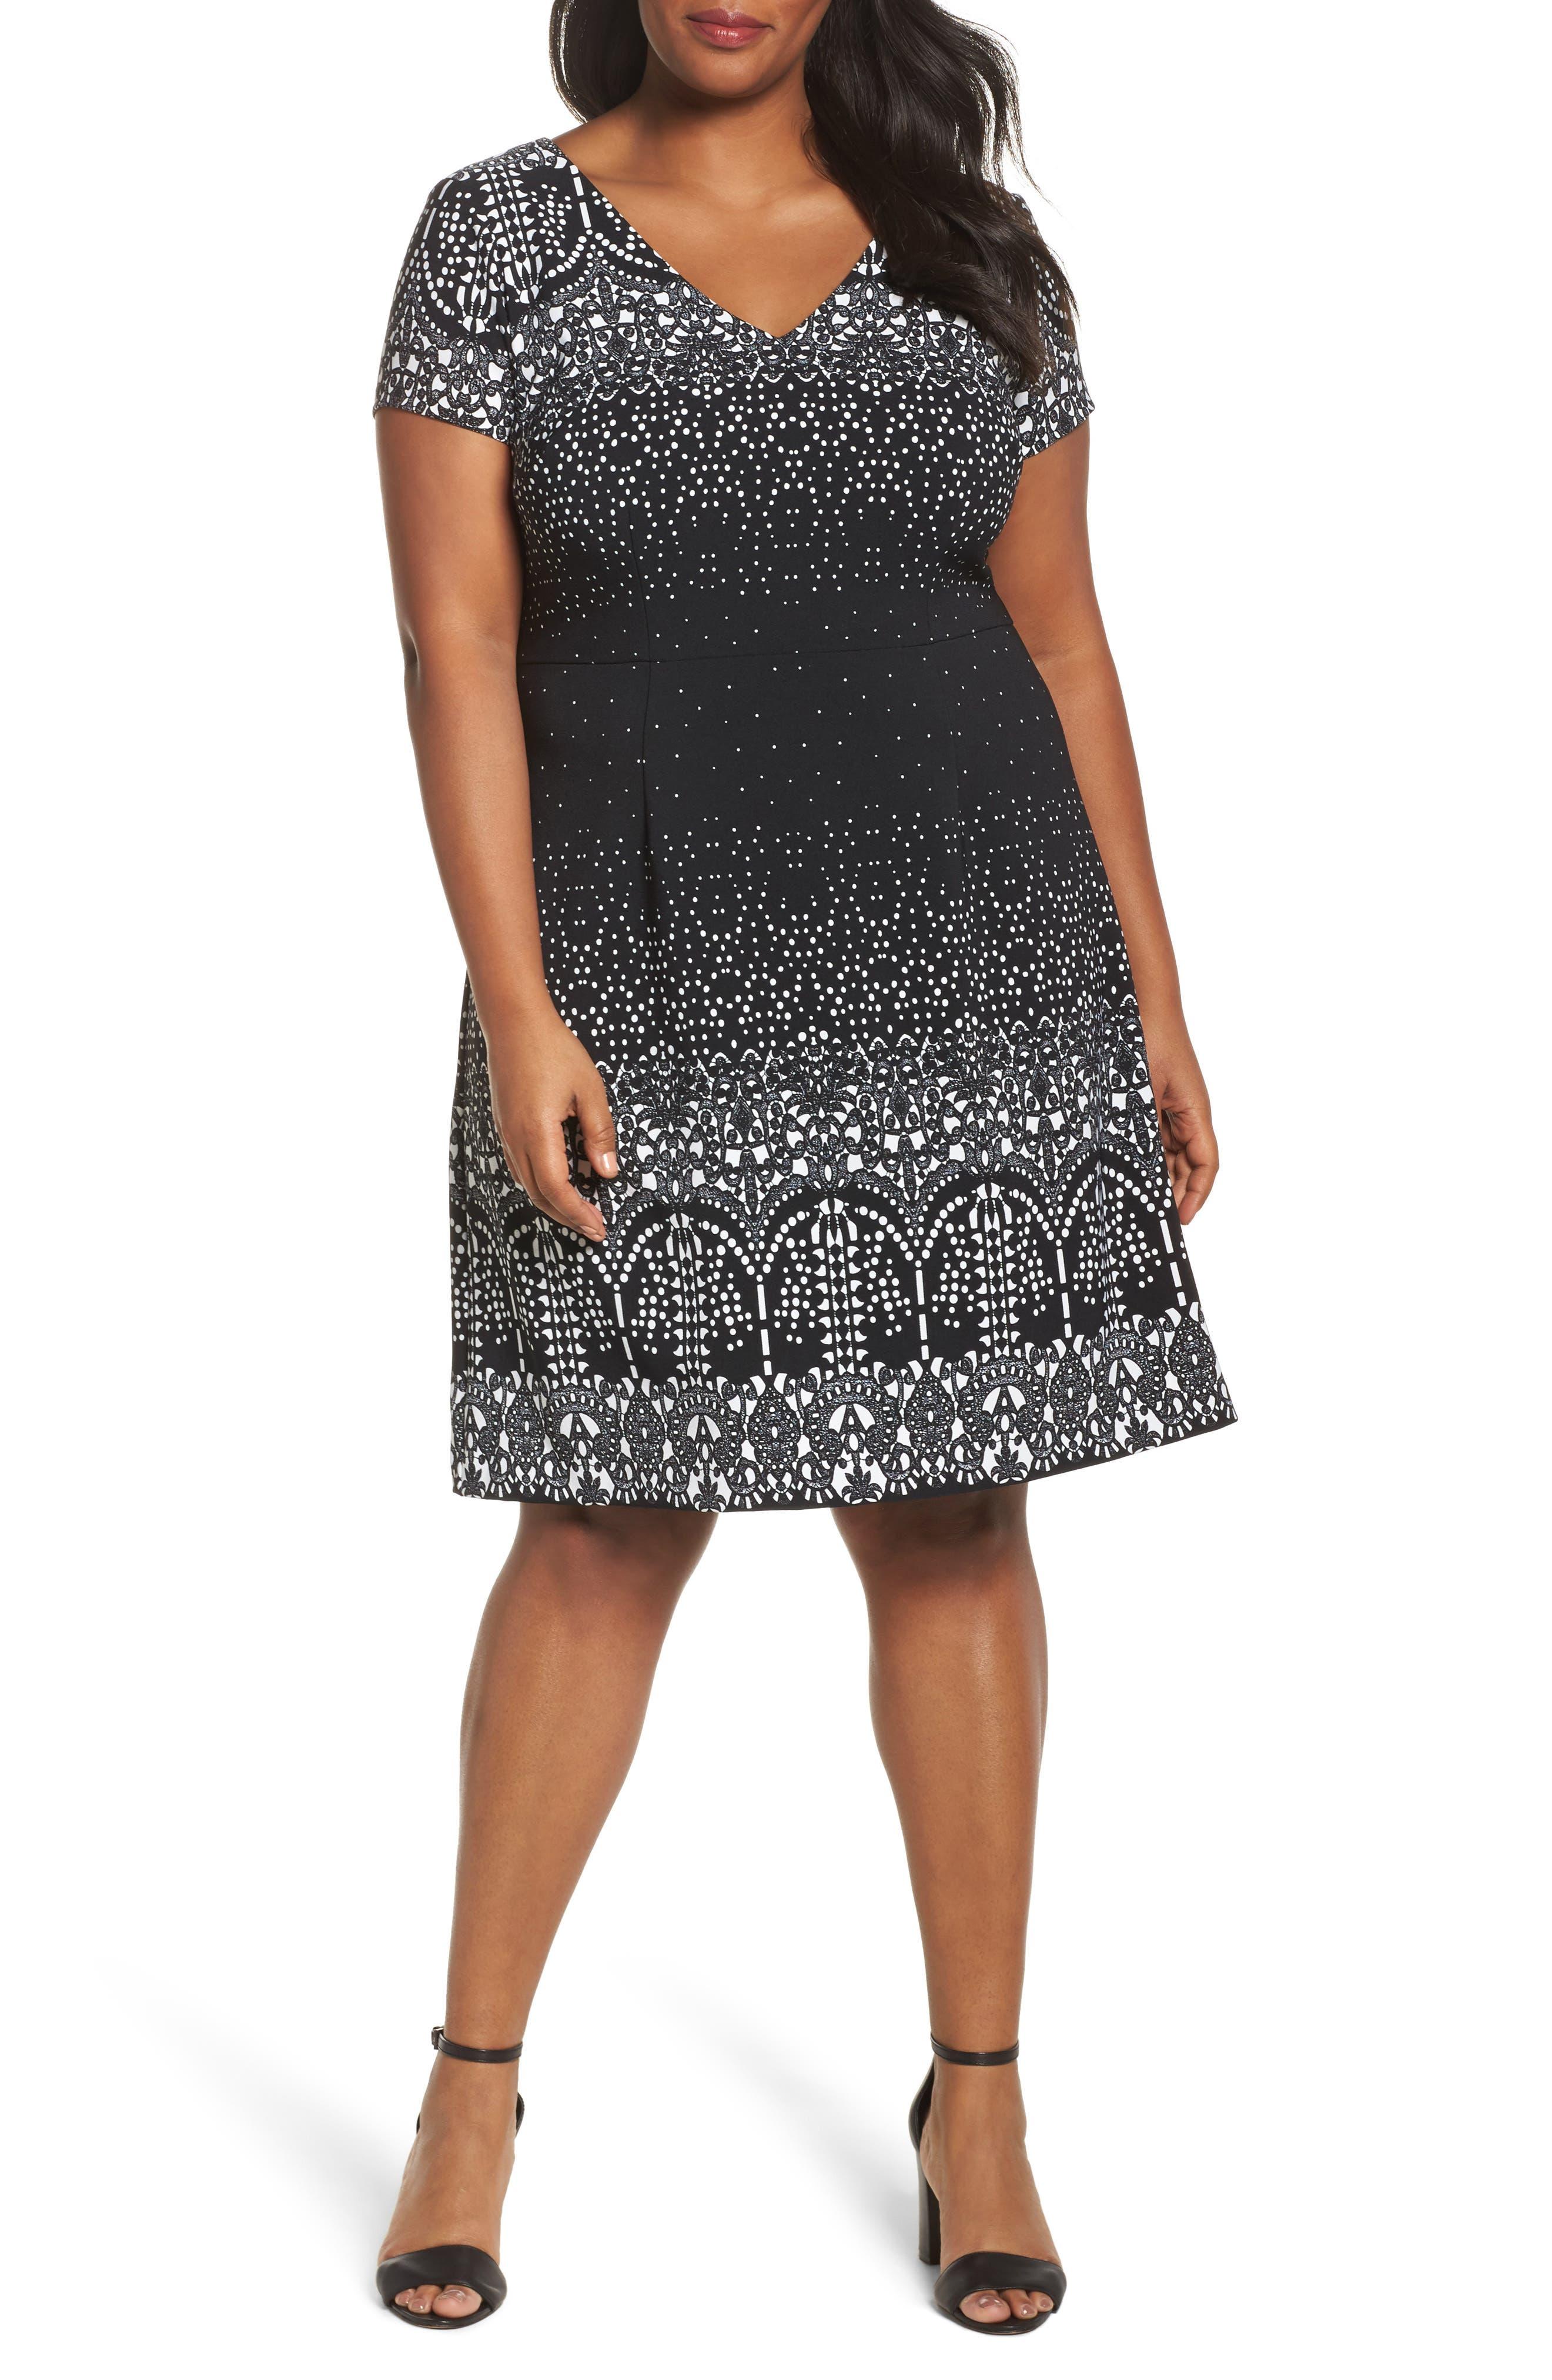 Adrianna Papell Lace Majesty Print A-Line Dress (Plus Size)